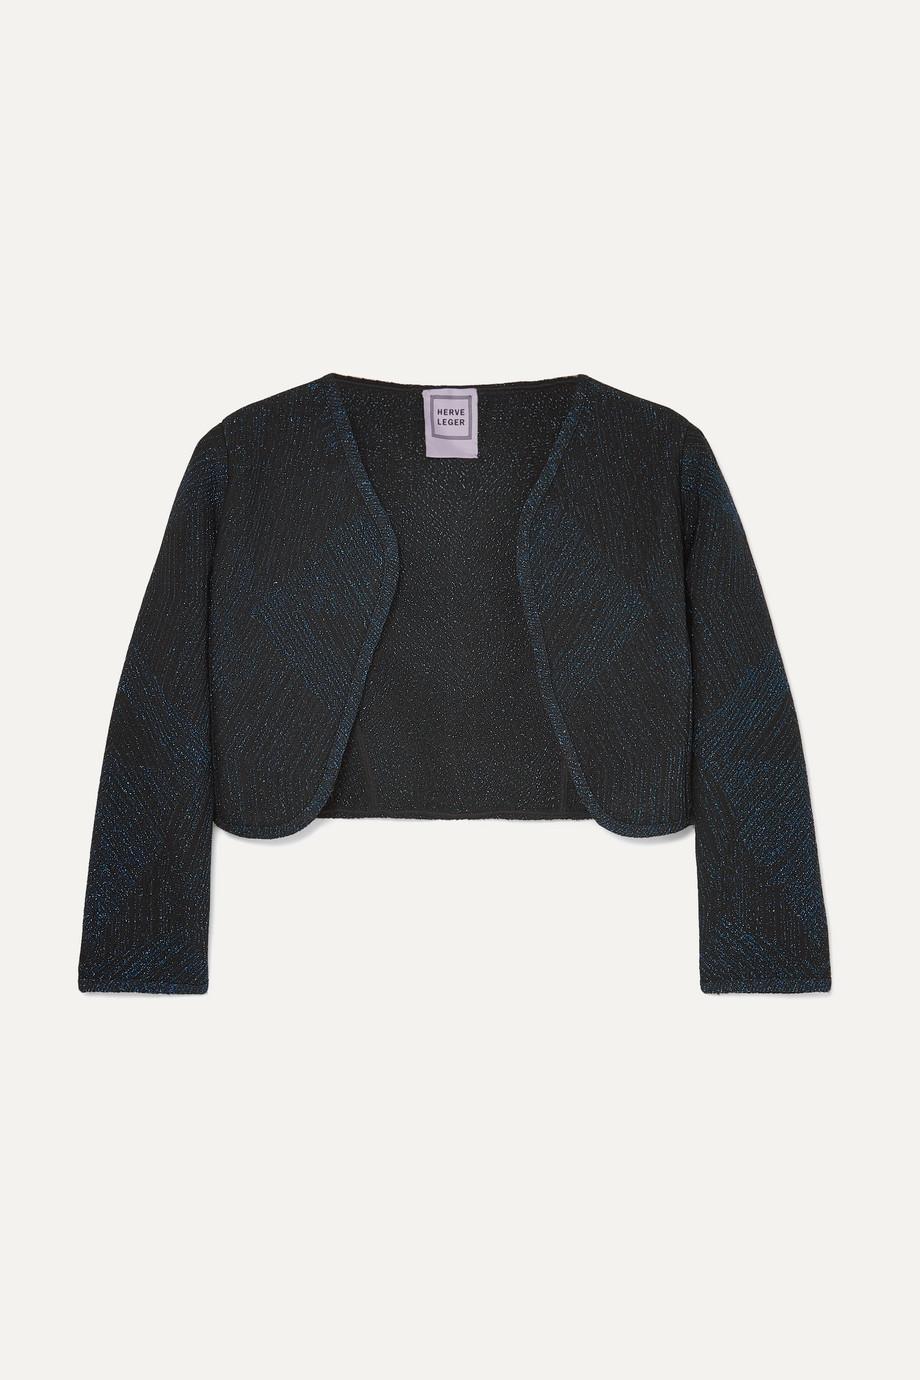 Hervé Léger Cropped metallic jacquard-knit jacket